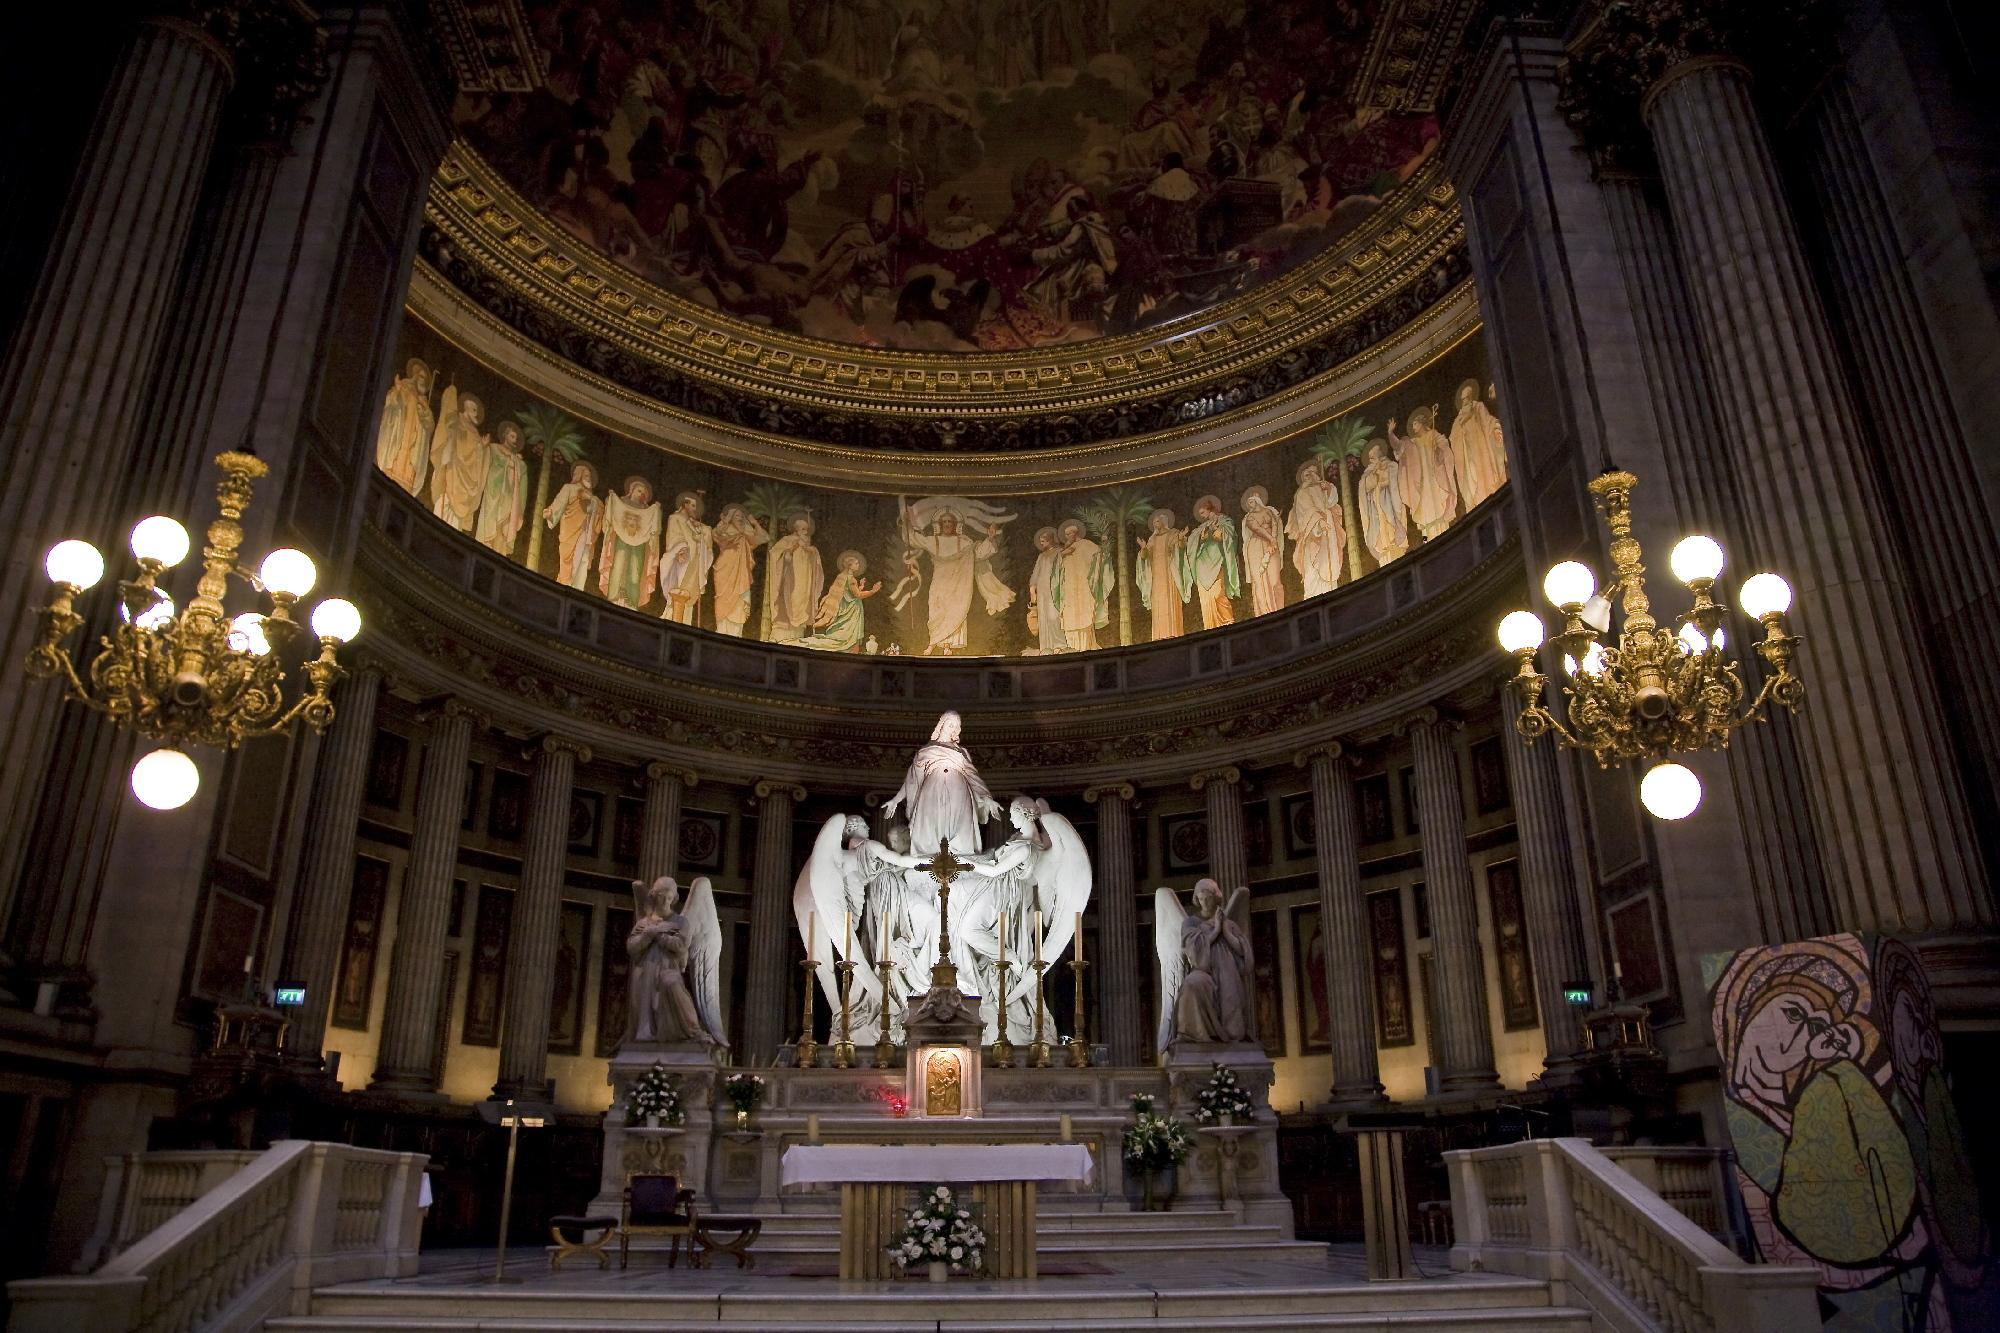 Eglise de la madeleine la madeleine paris for Piscine la madeleine